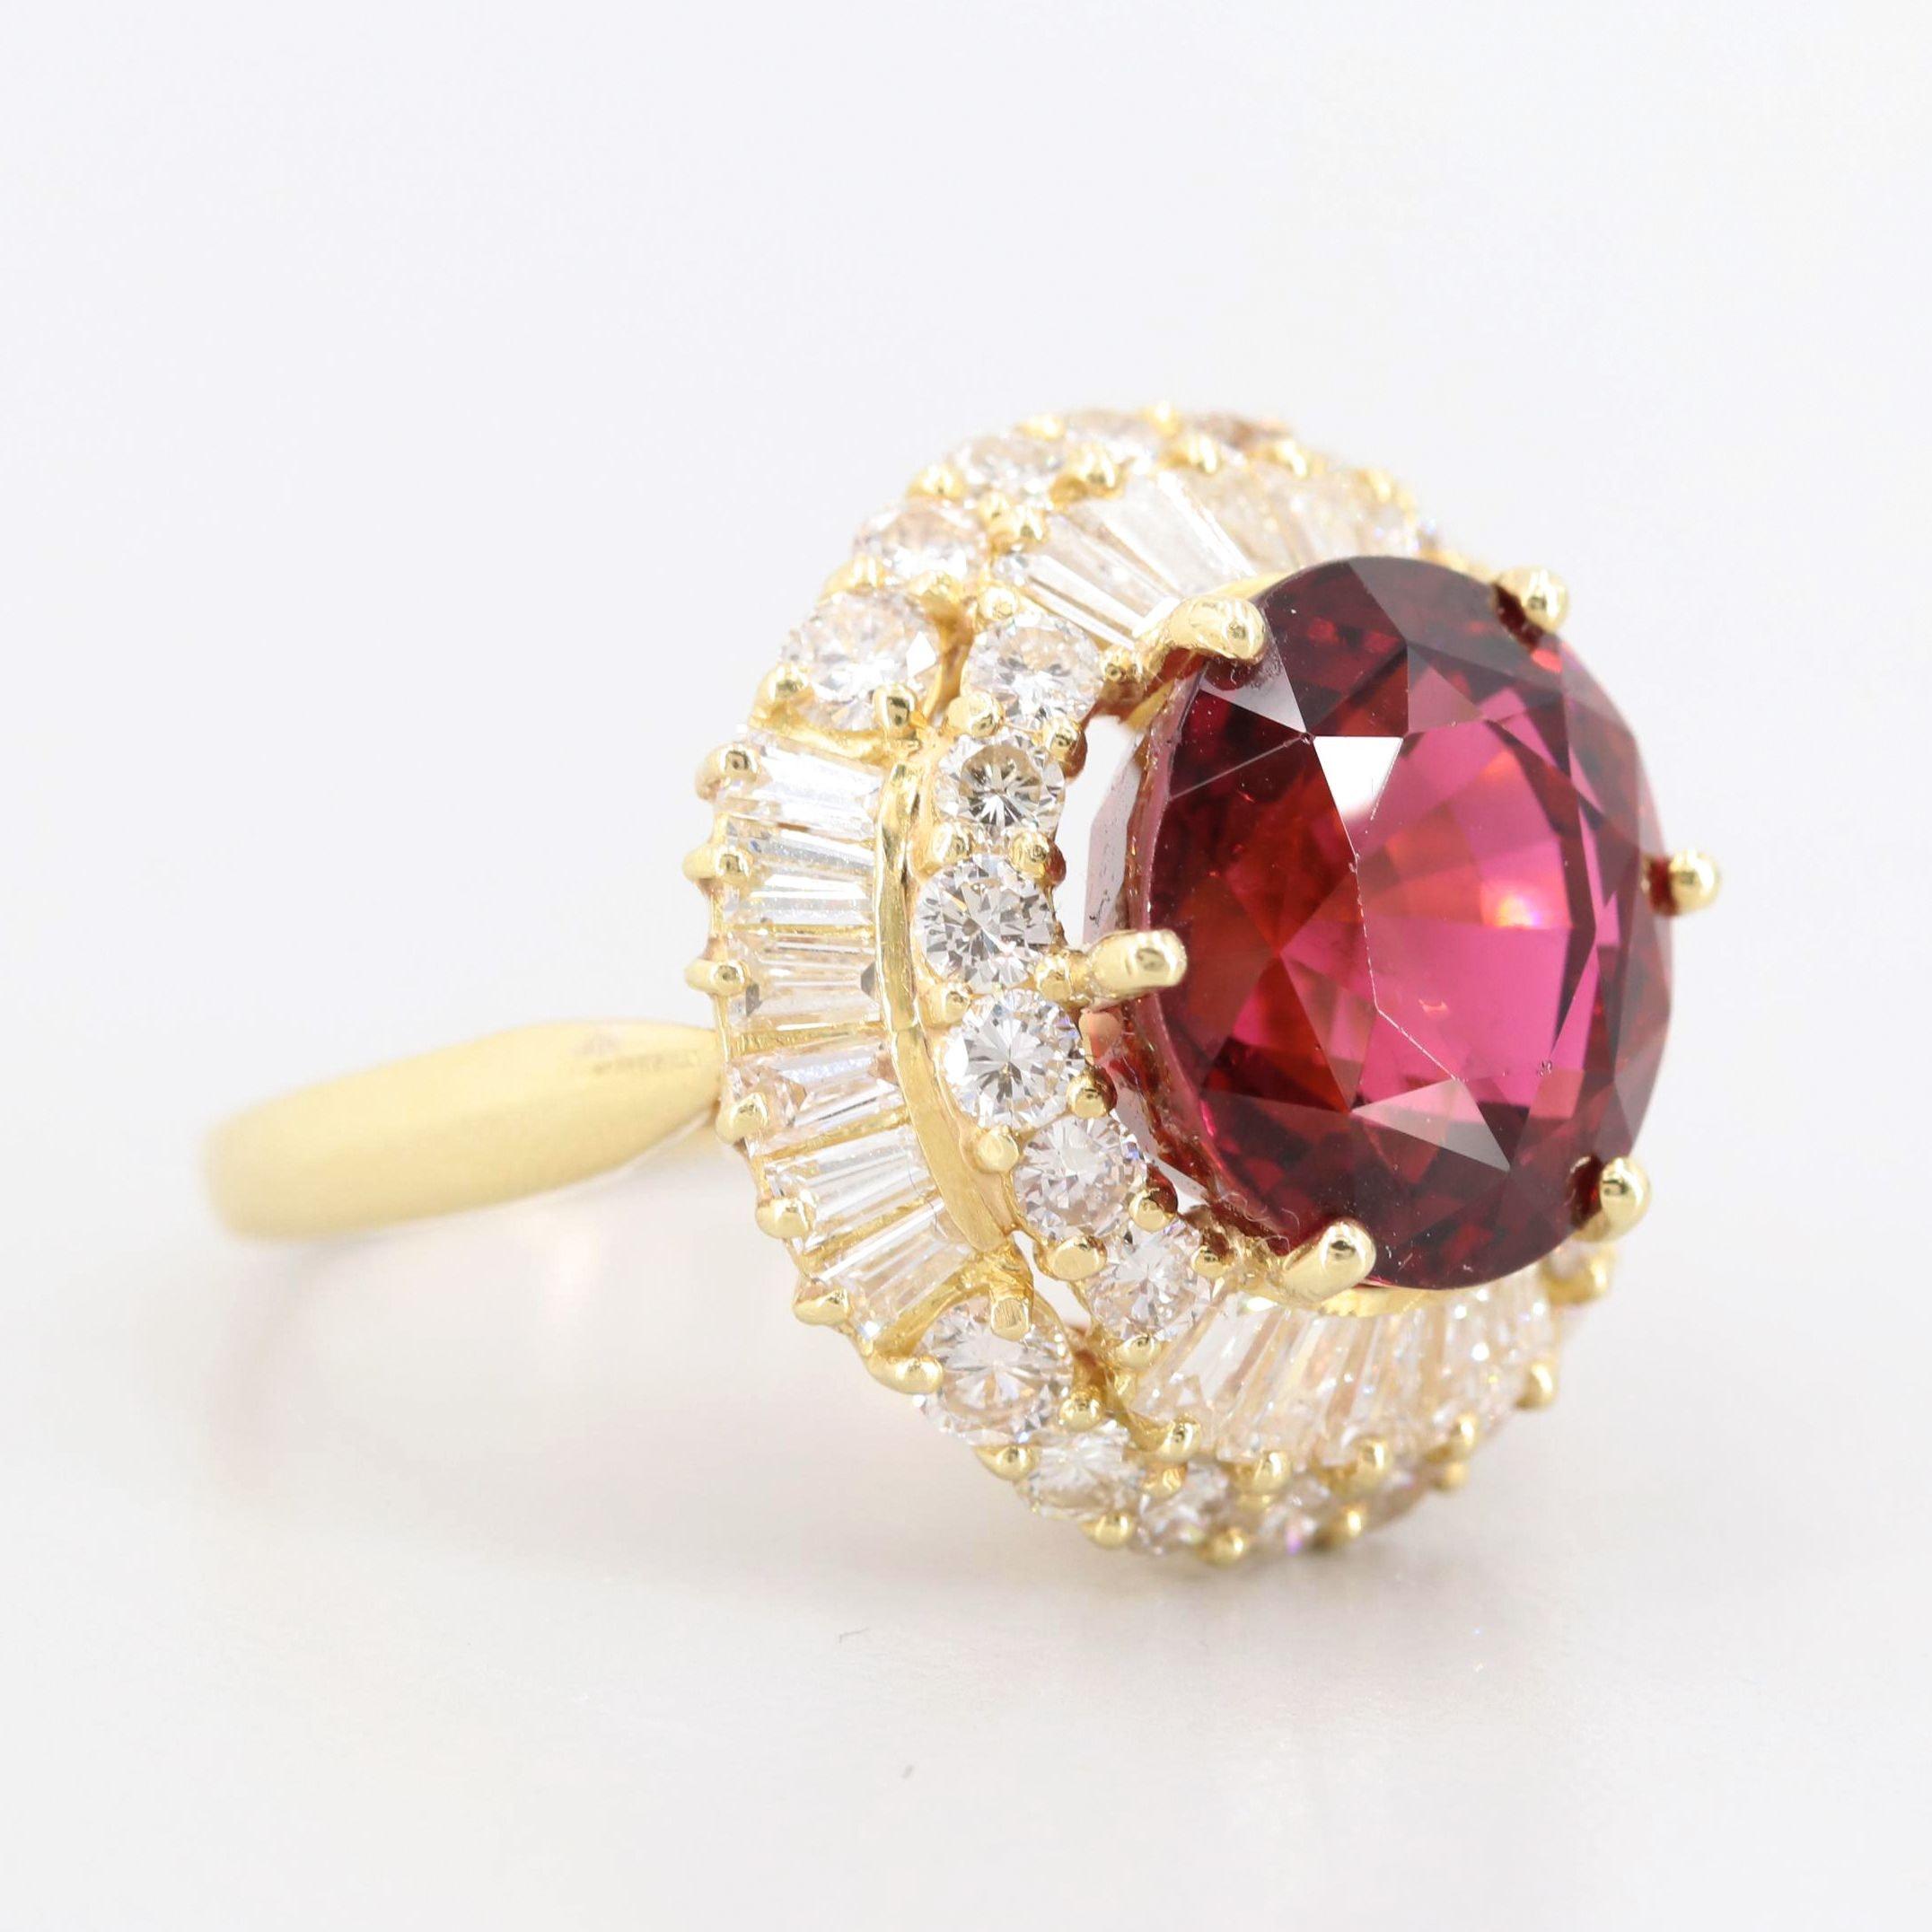 18K Yellow Gold 9.48 CT Pink Tourmaline and 3.95 CTW Diamond Ring